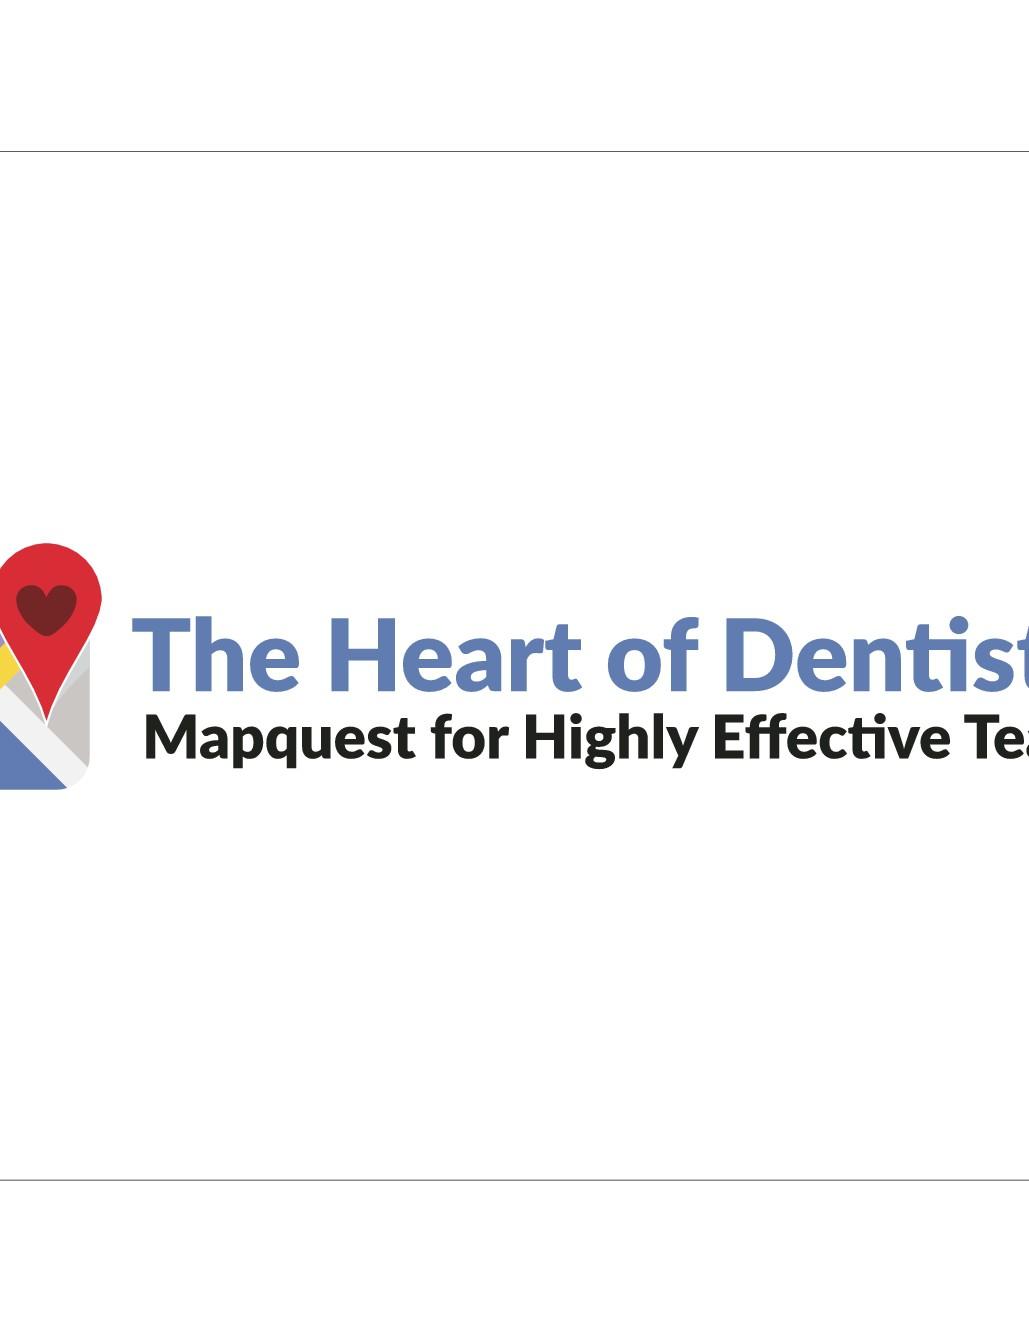 The Heart of Dentistry.com